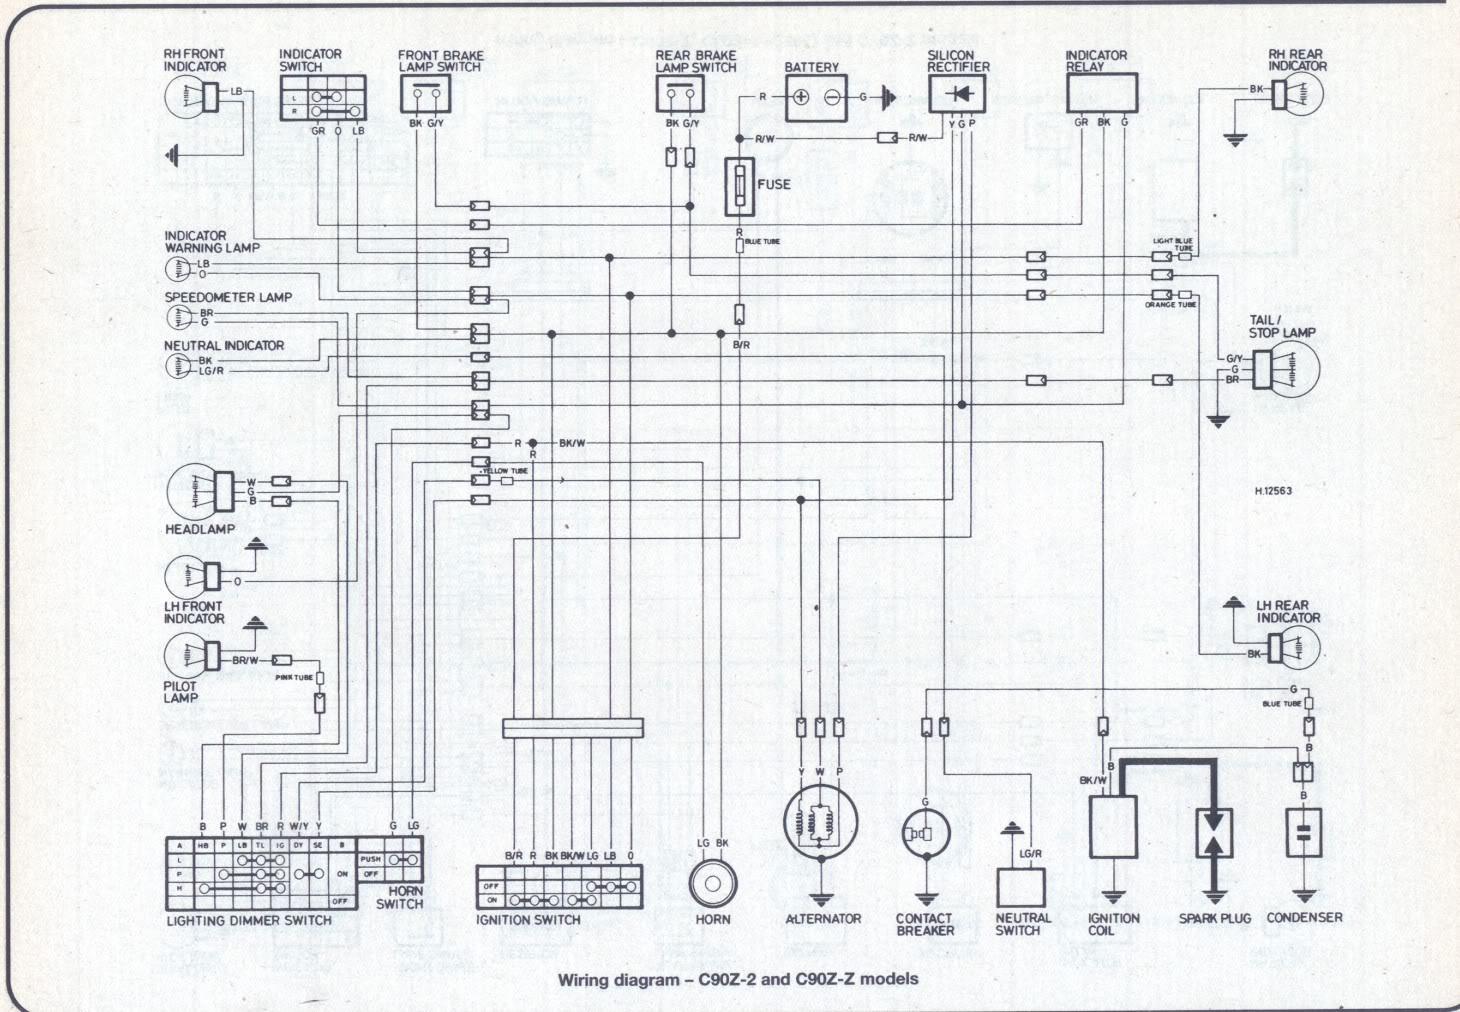 [CSDW_4250]   DS_0275] And Diagram Useful Honda Just Picture The Of Diagram E C90Zz Wiring  N Wiring Diagram | Honda C90 Wiring Diagram 6v |  | Abole Xeira Mohammedshrine Librar Wiring 101